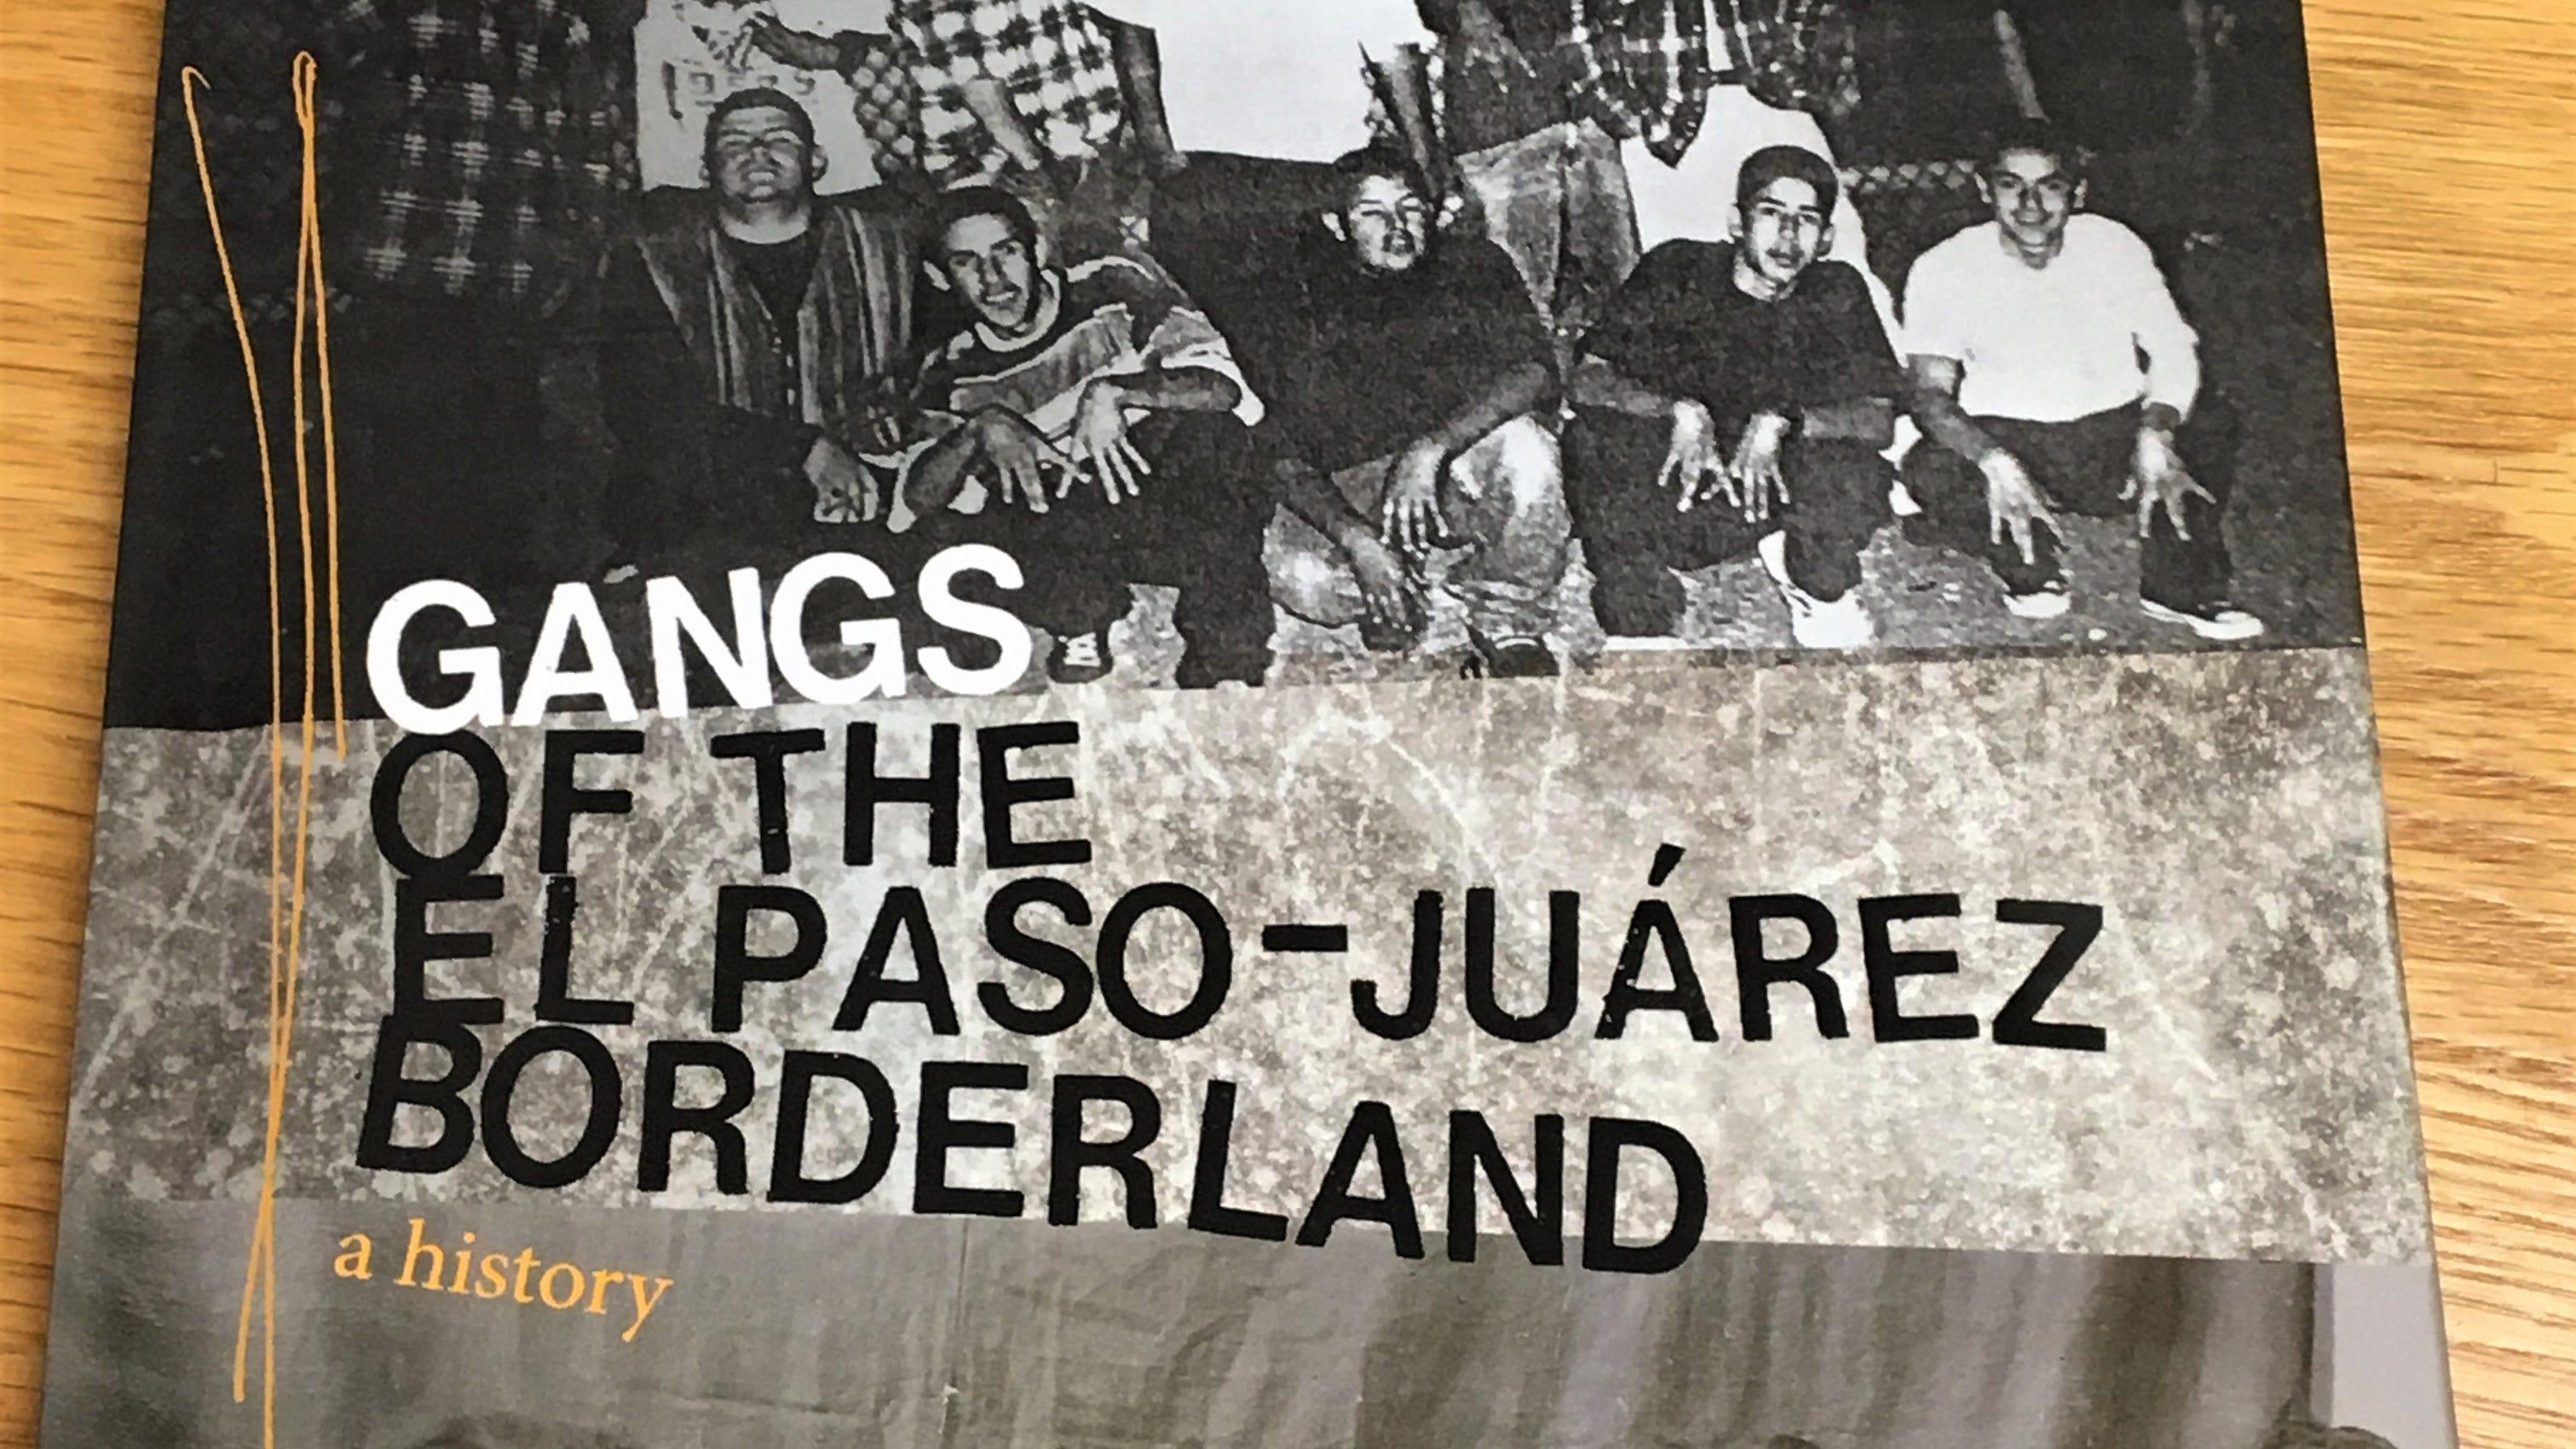 New book explores history of El Paso street gangs